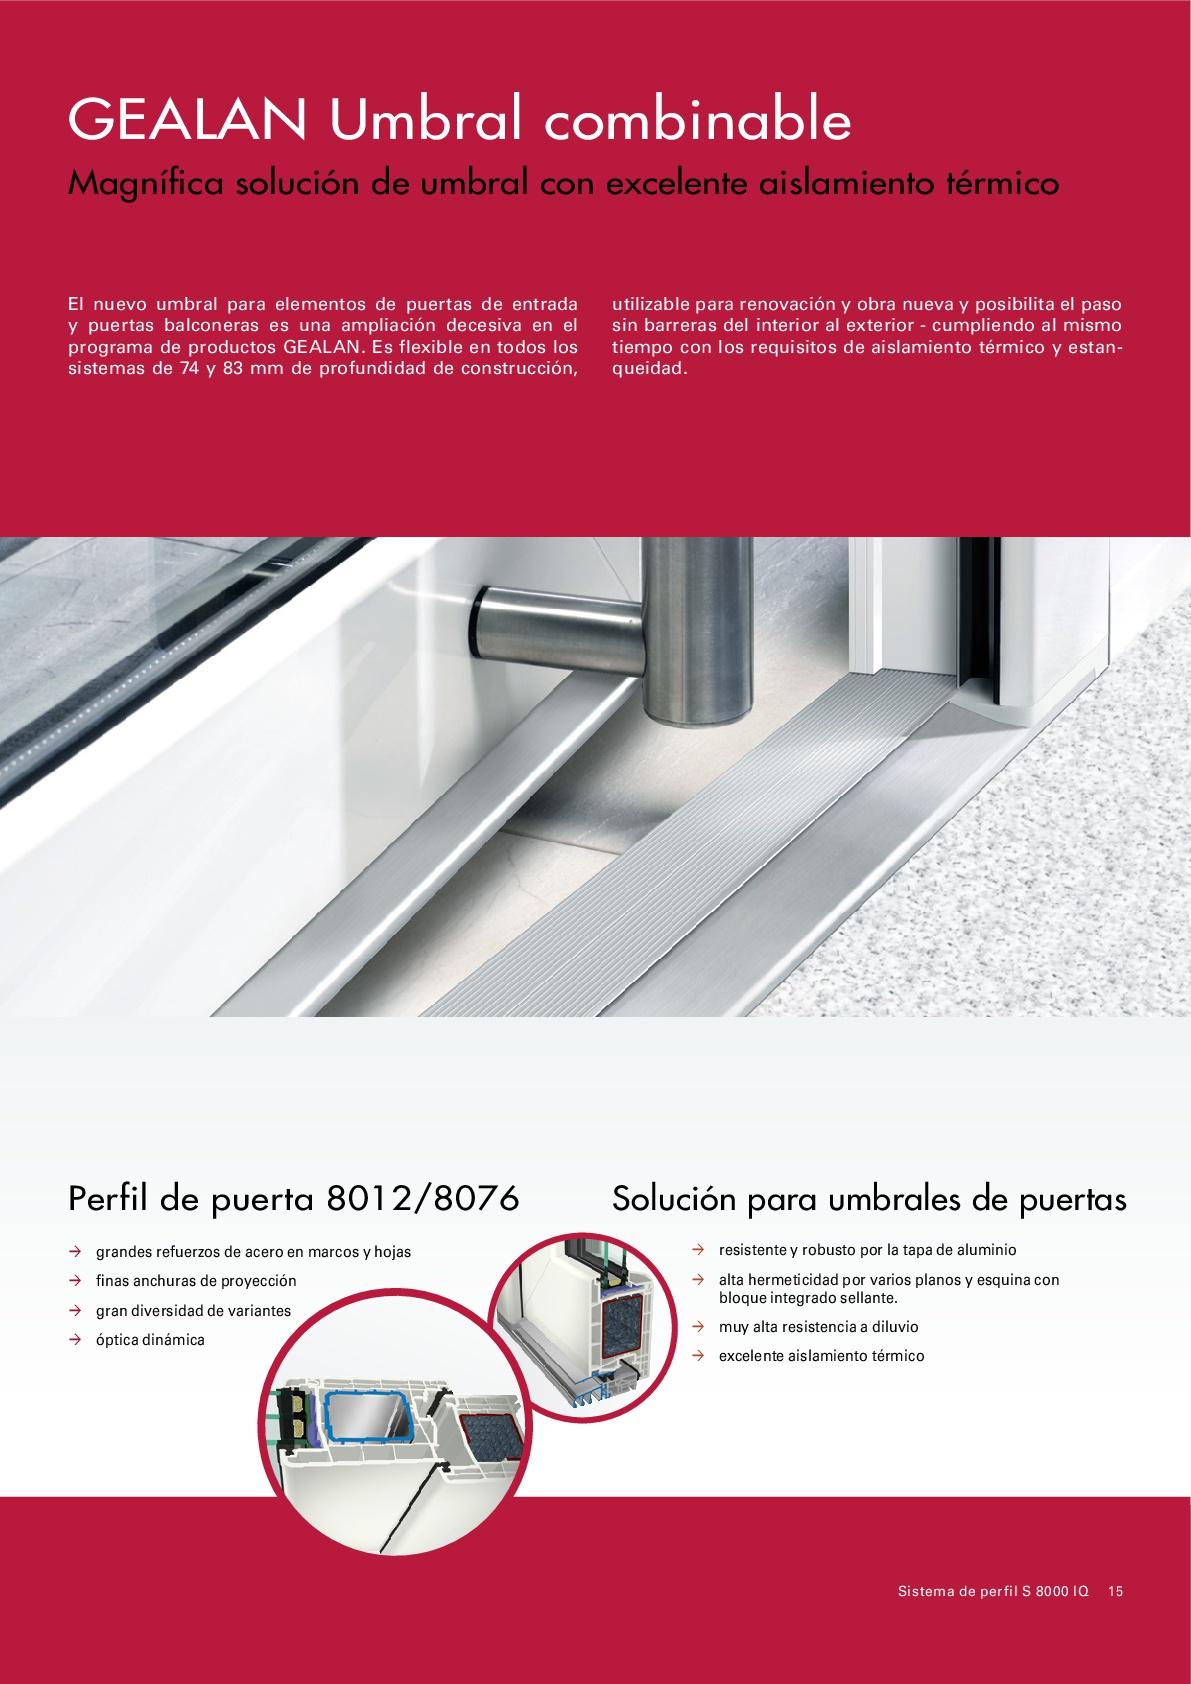 folleto-015